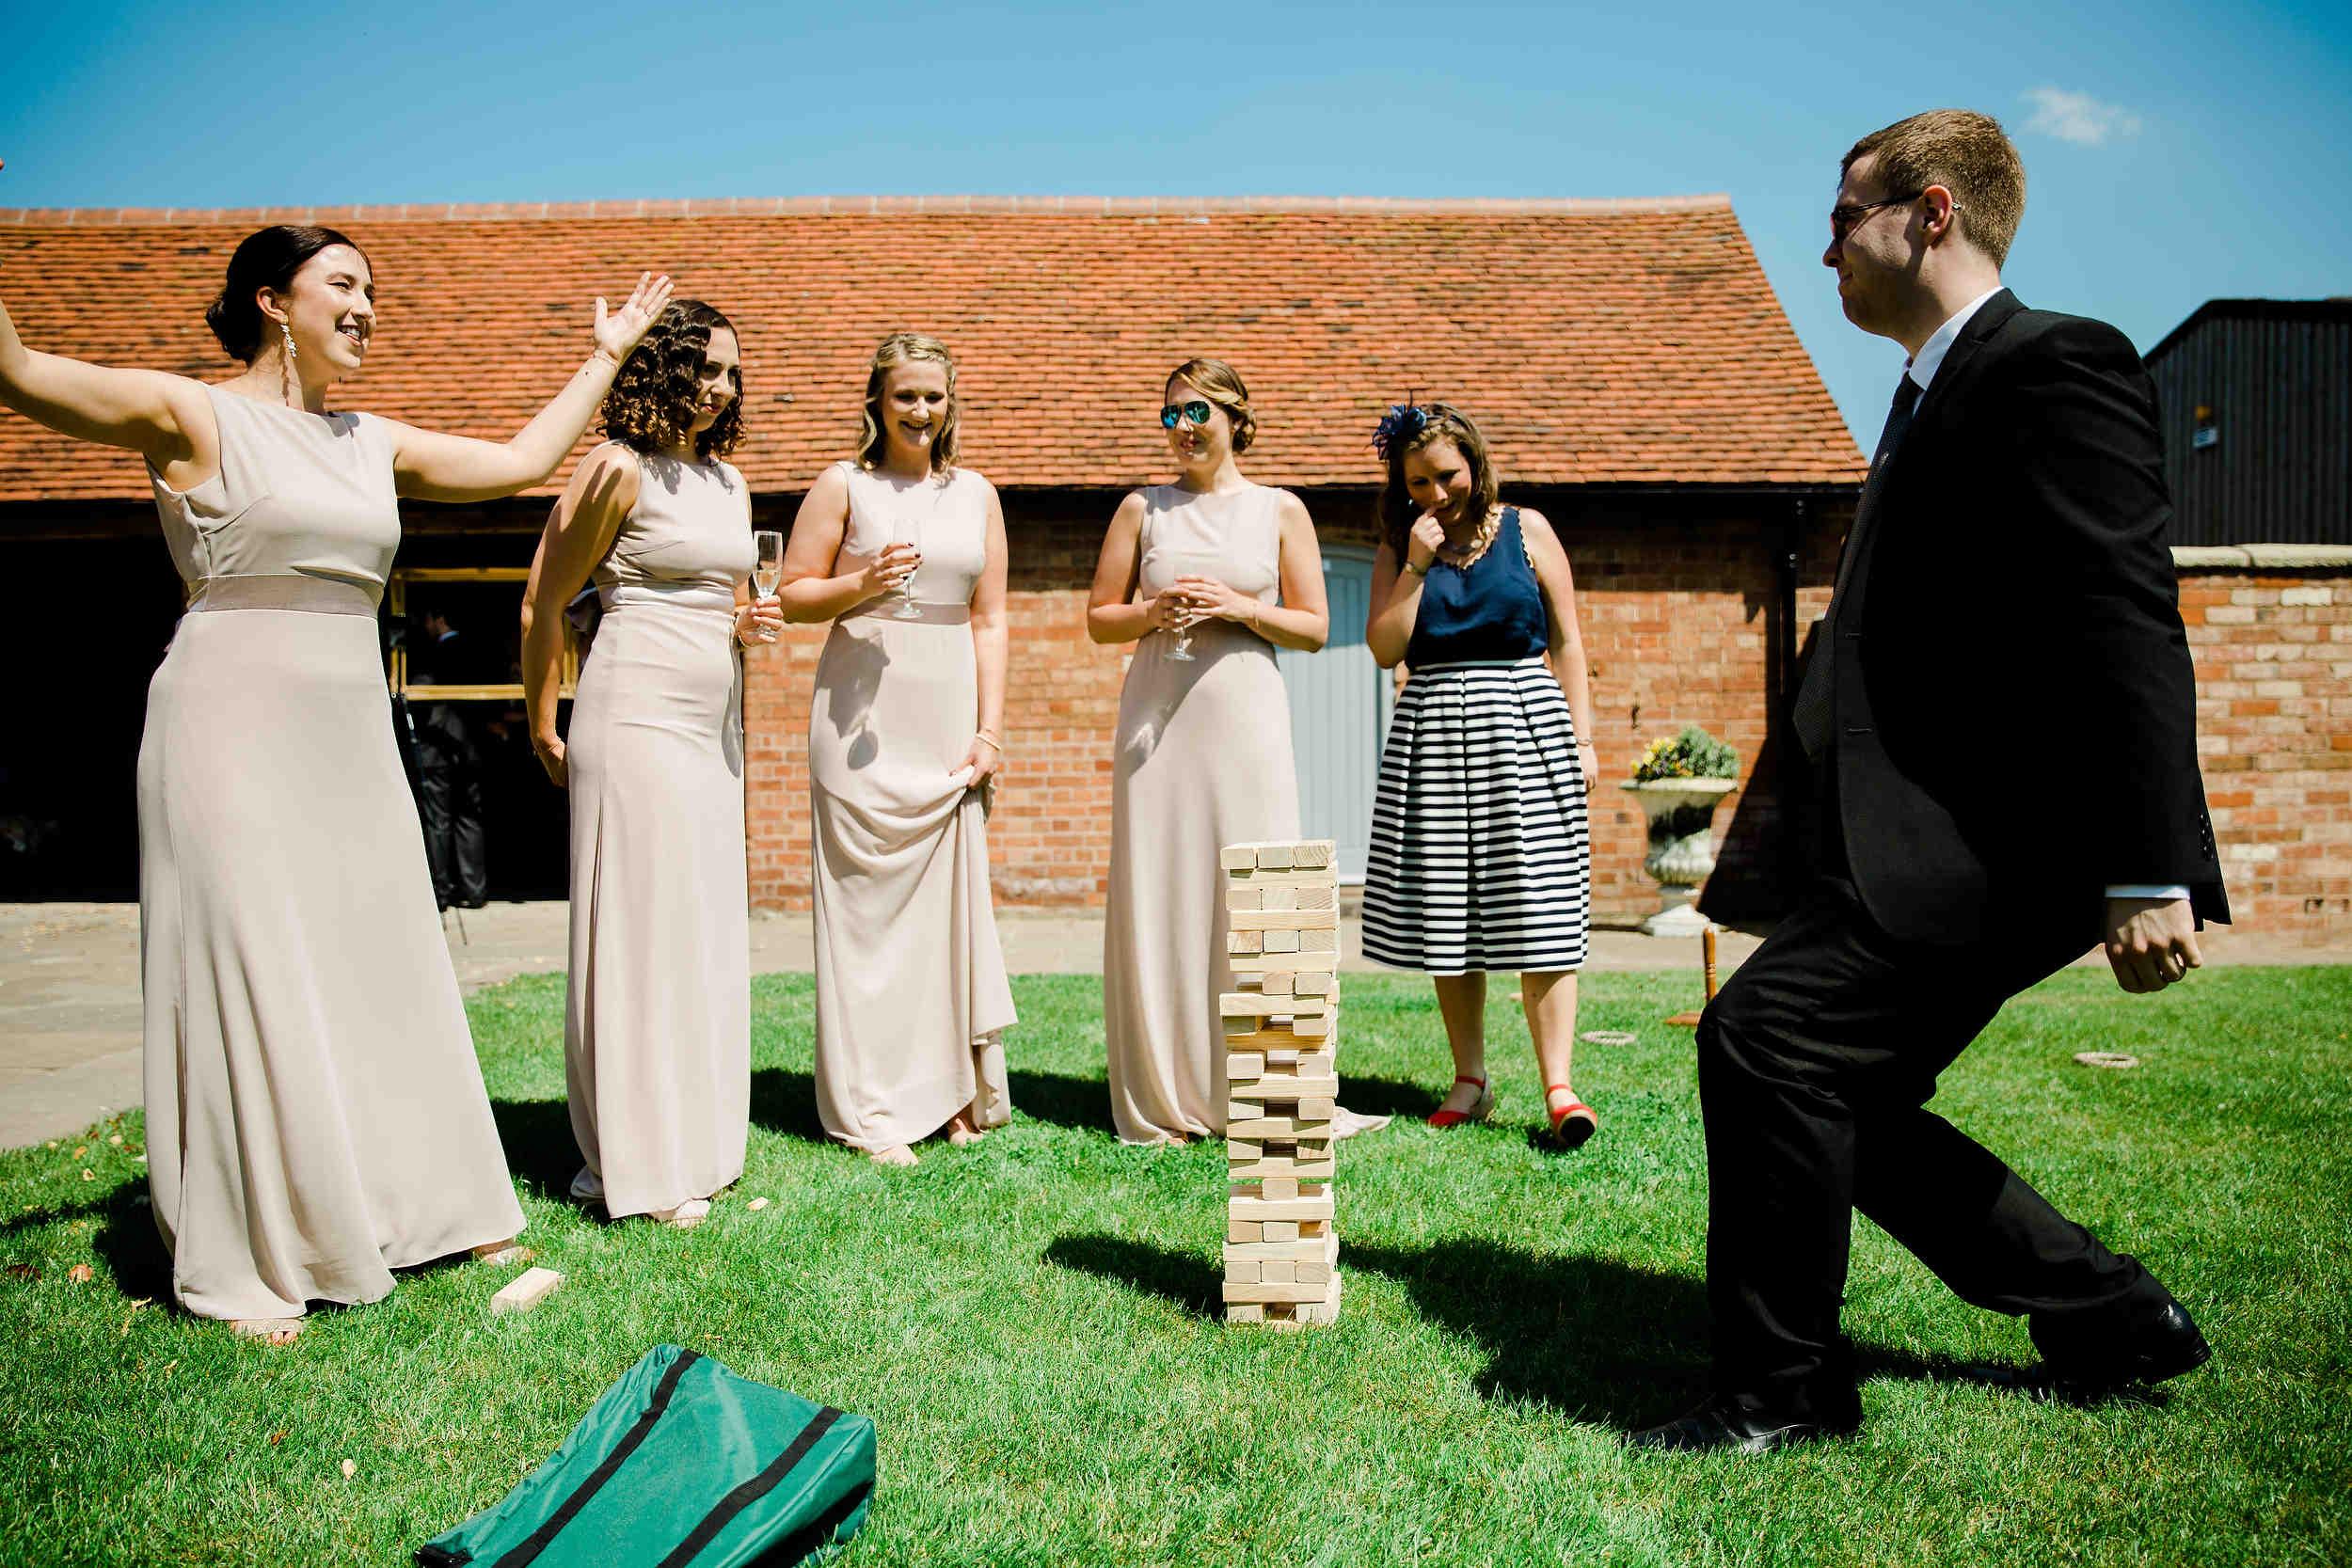 giant jenga at swallows nest barn wedding garden games